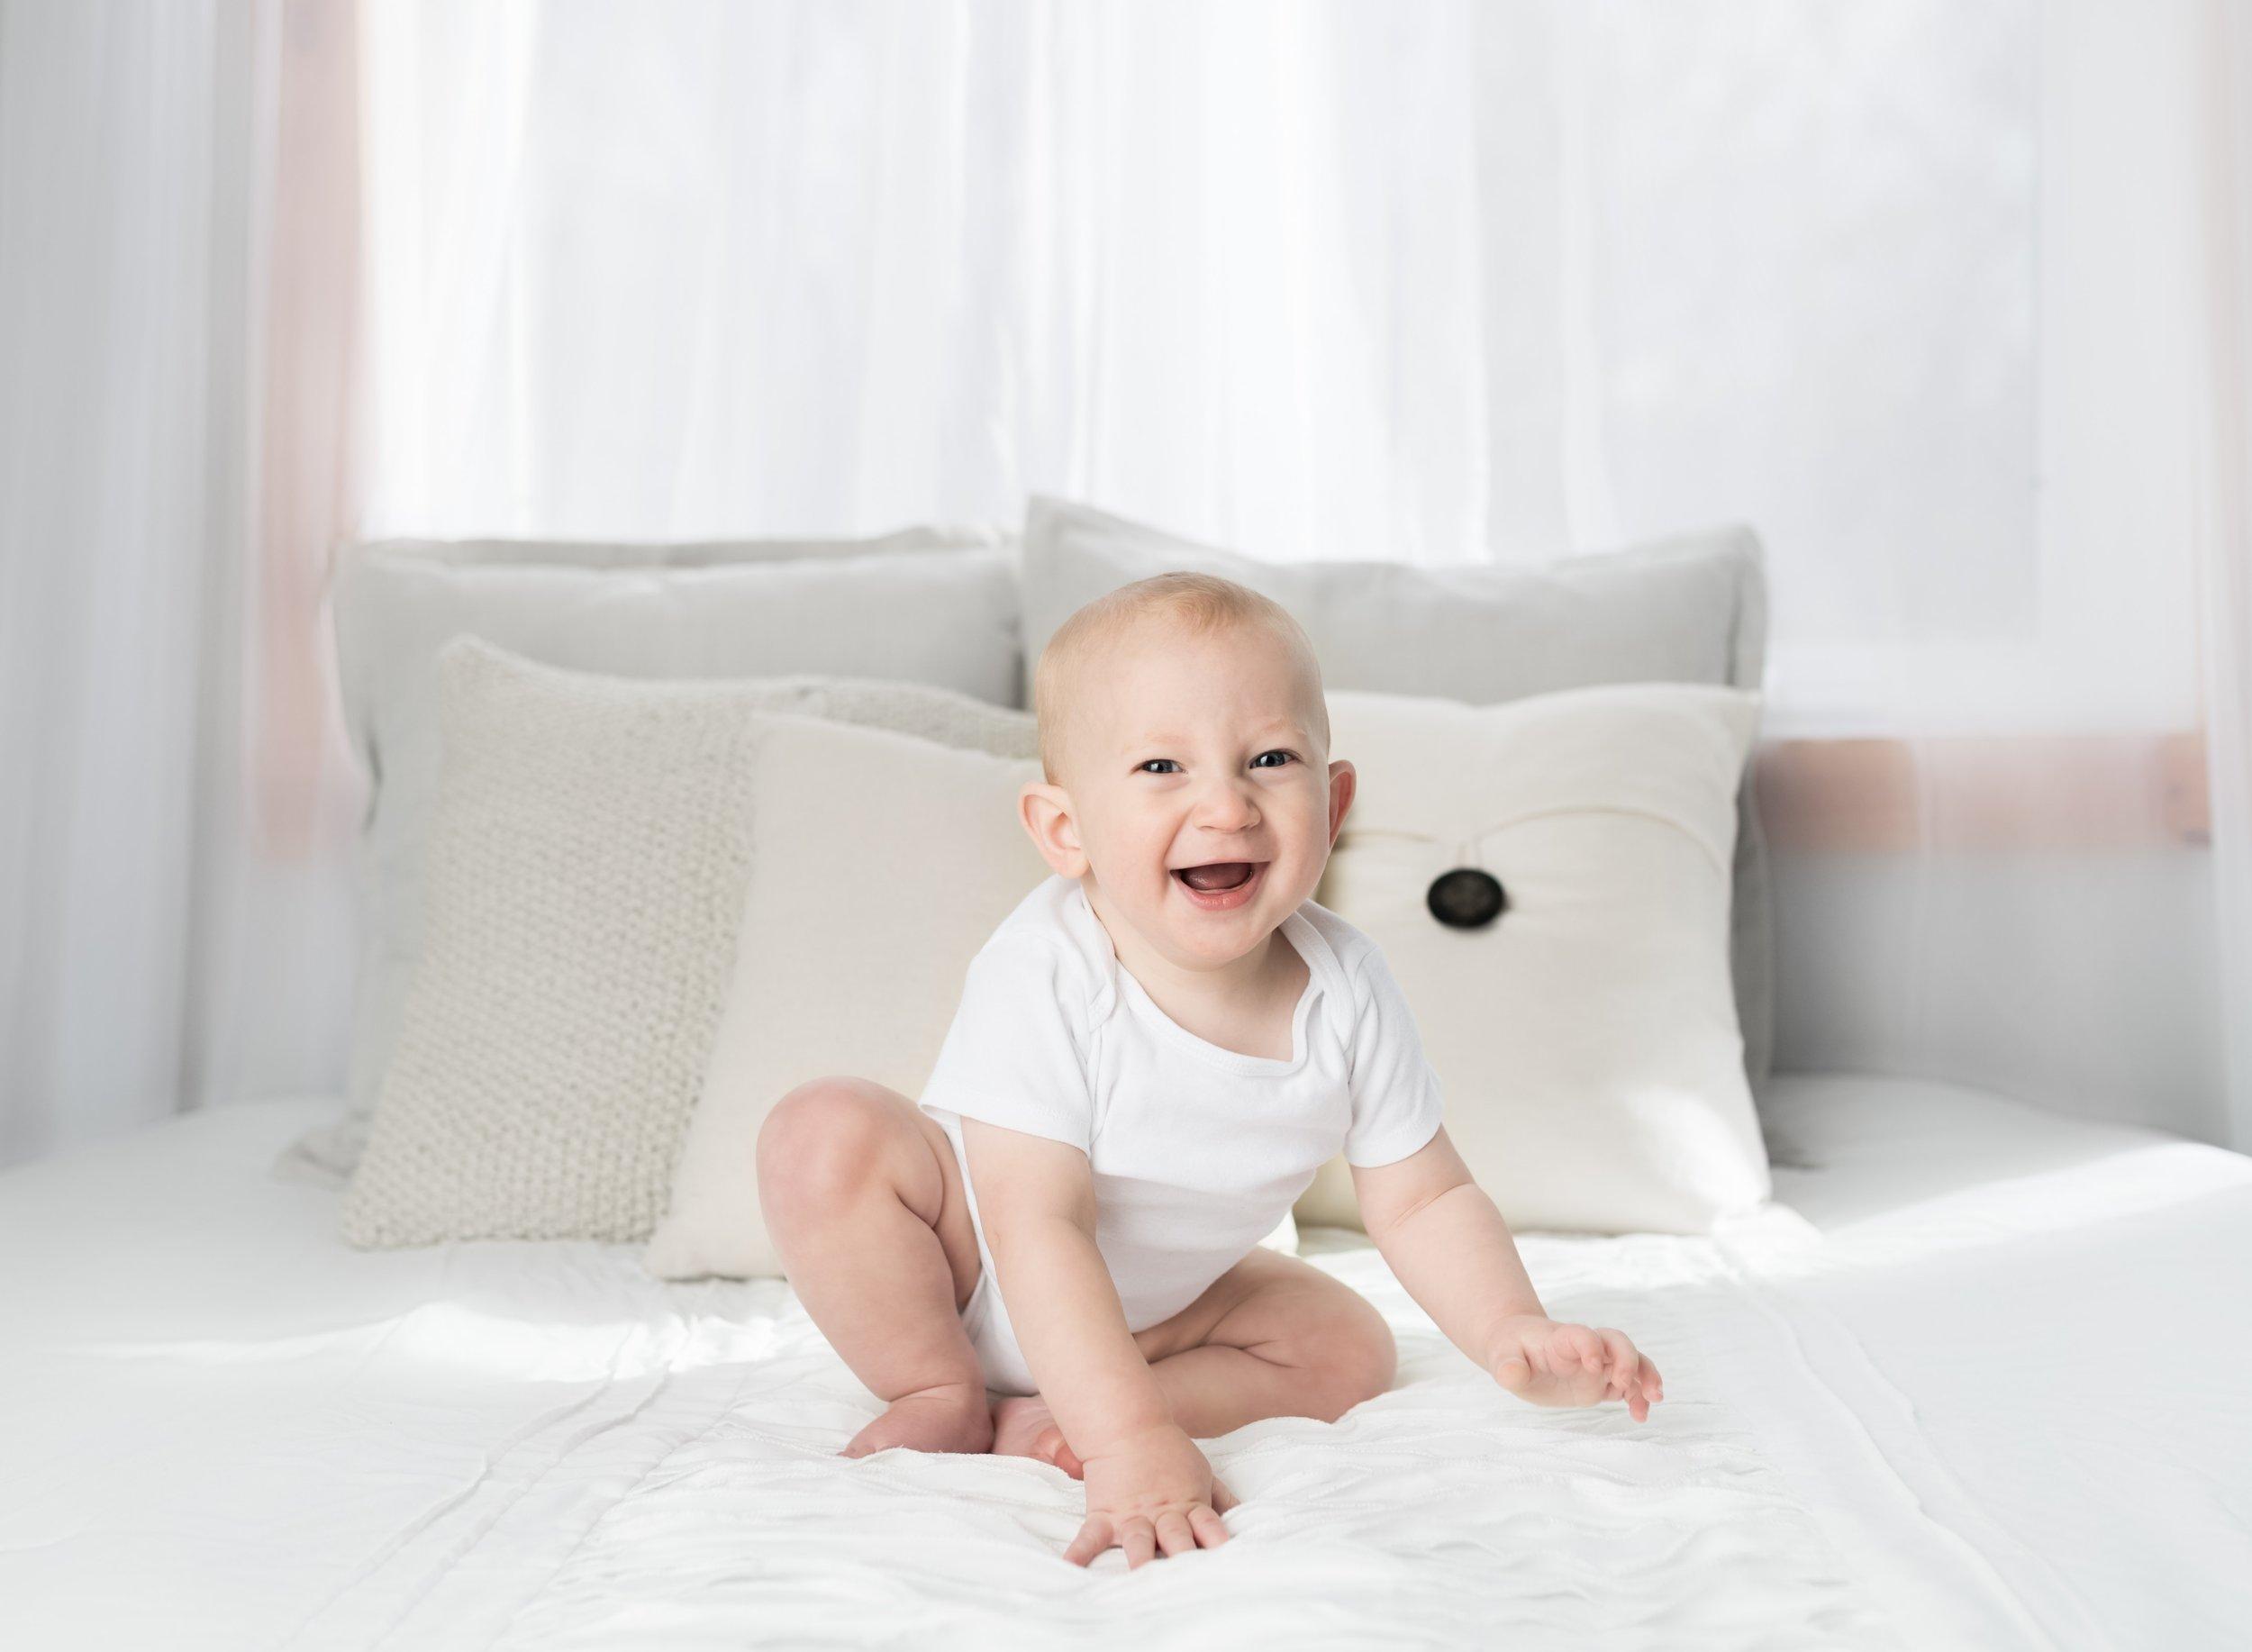 raleigh postpartum doula